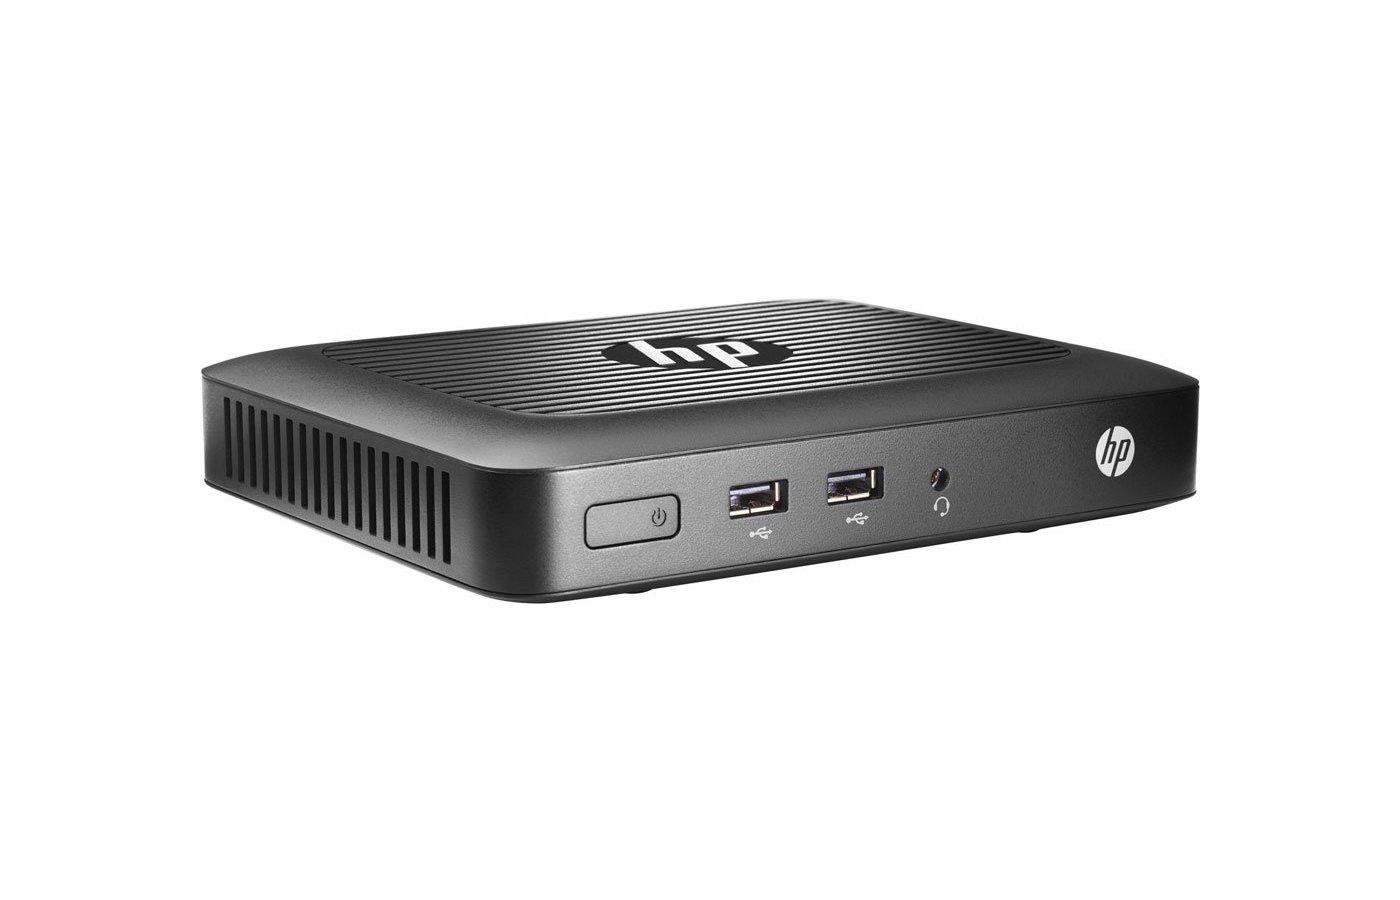 Системный блок HP t420 /M5R72AA/